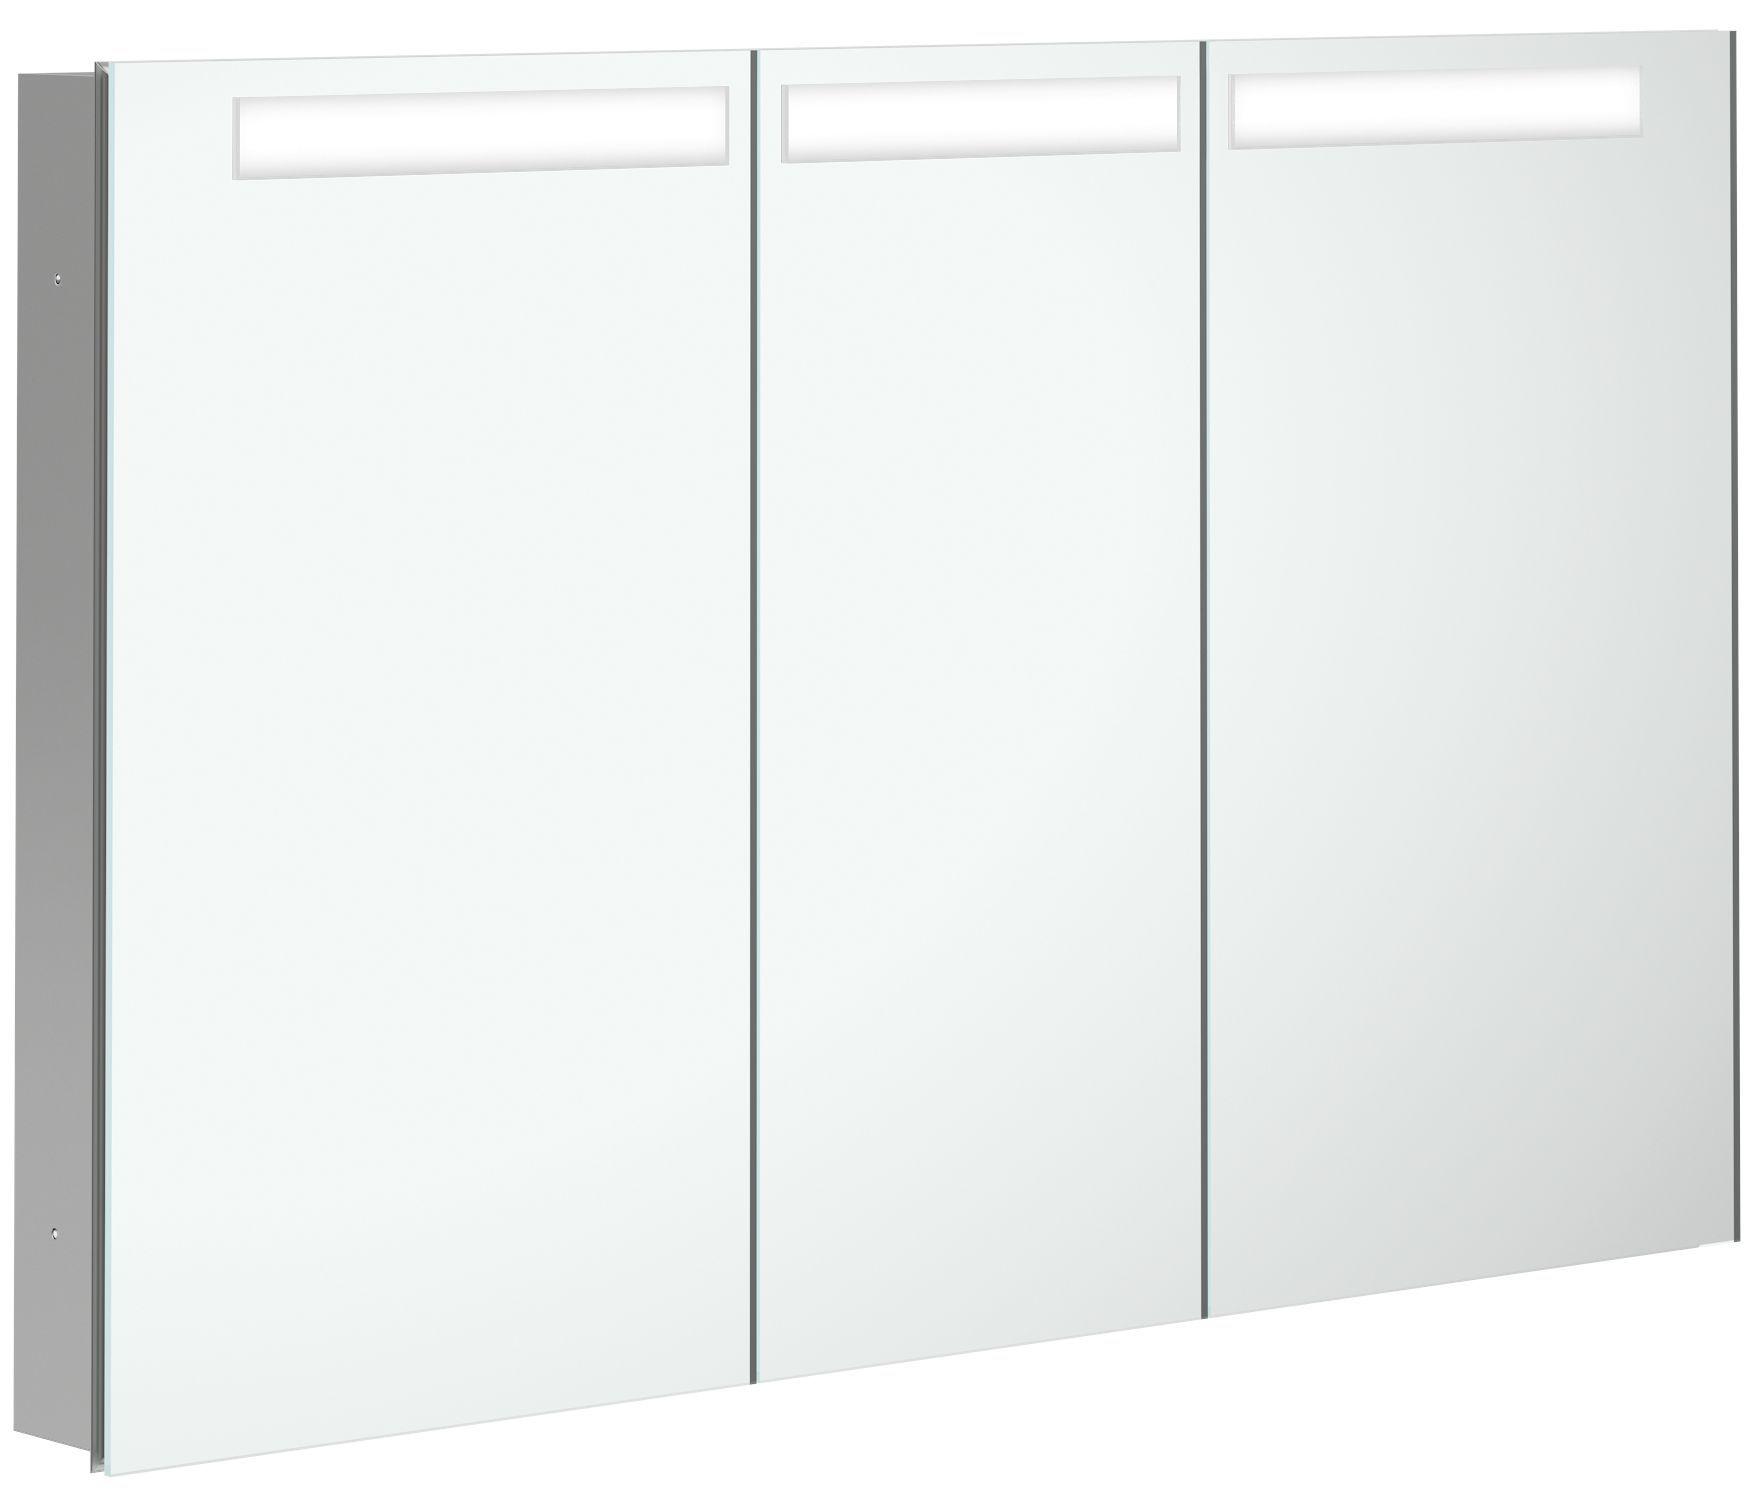 Villeroy & Boch My View In Spiegelschrank mit LED Beleuchtung B:120,1xH:74,7xT:10,7cm A4351200